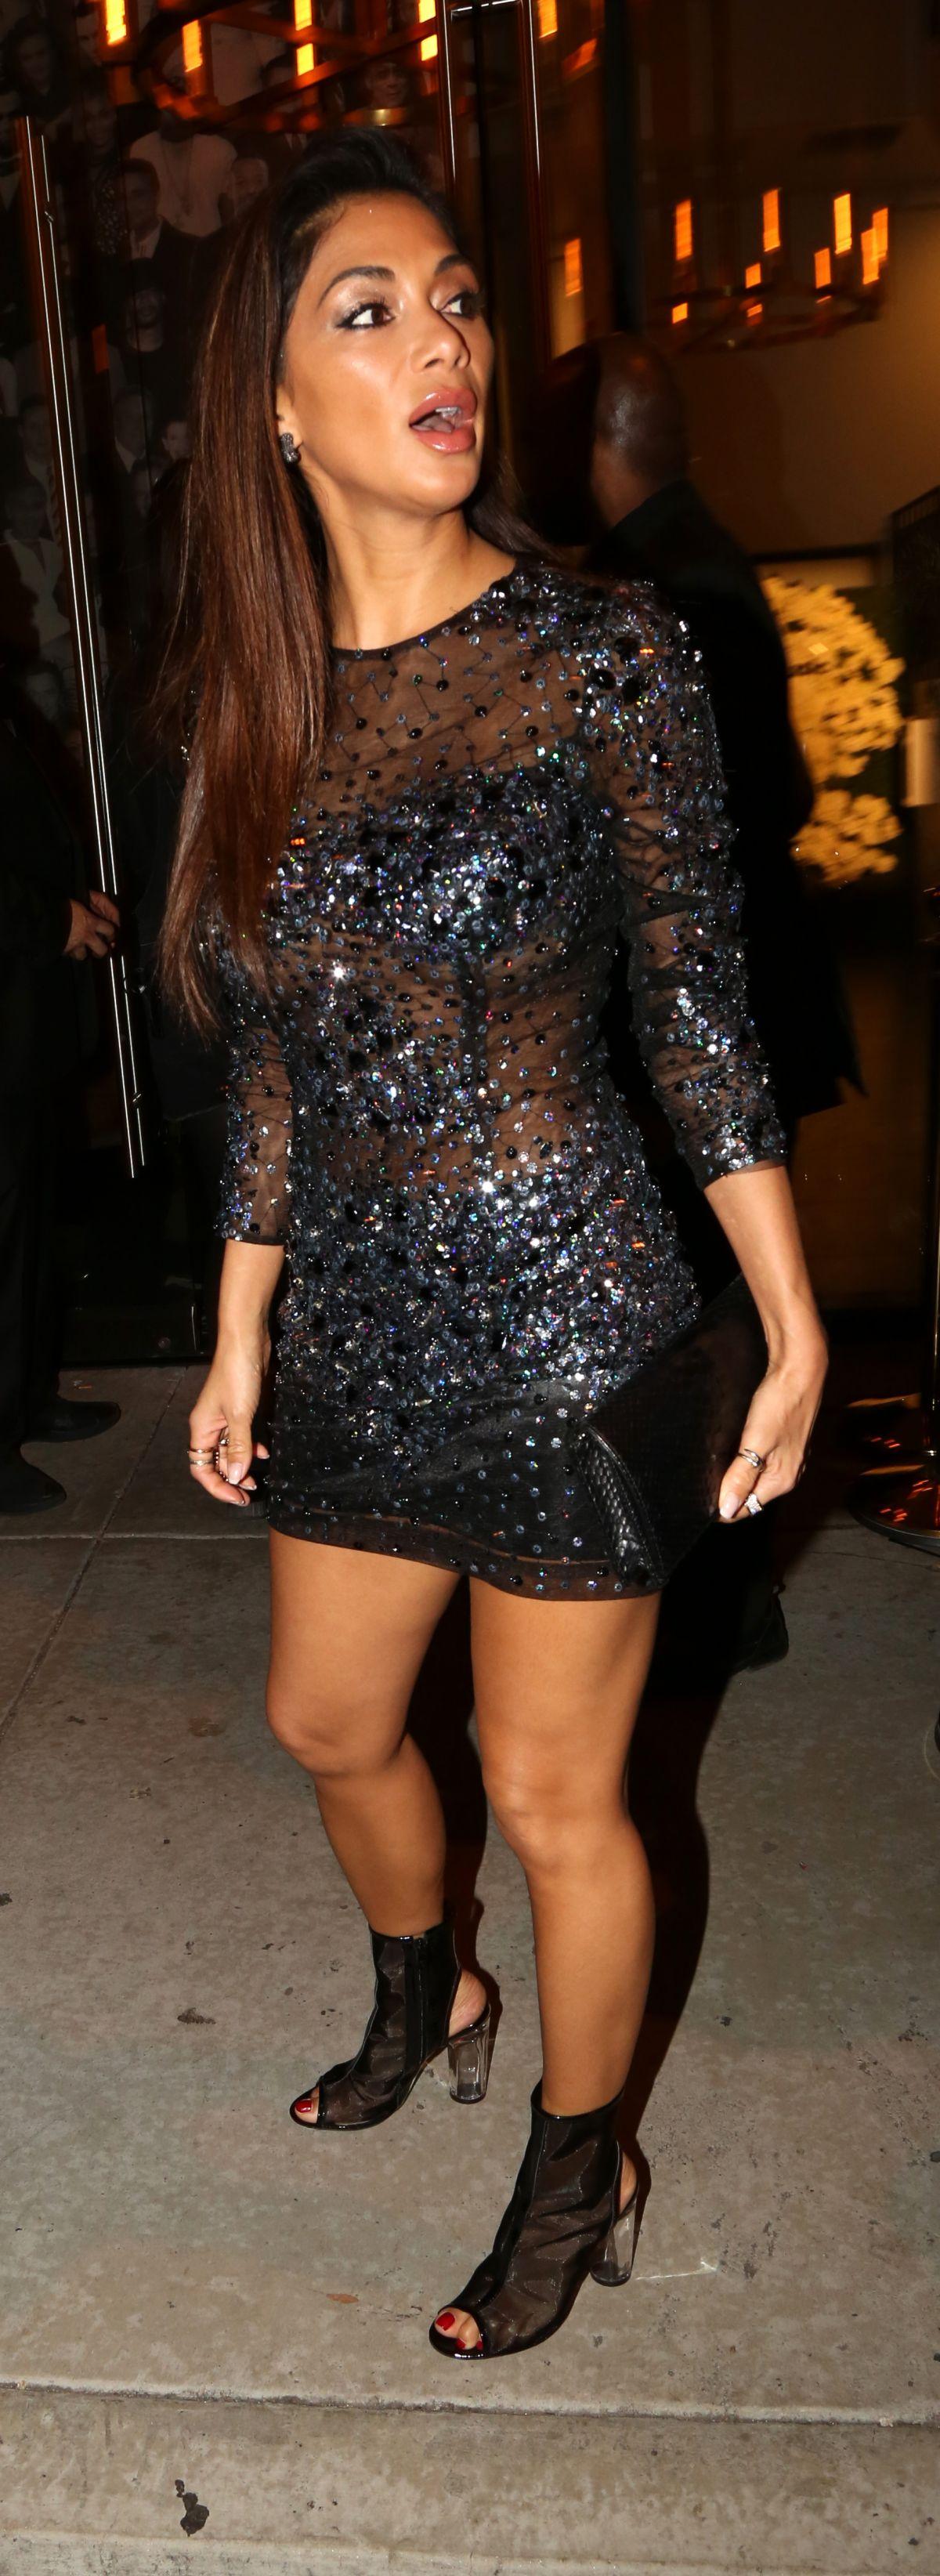 Nicole Scherzinger Archives - Page 2 of 28 - HawtCelebs ... Nicole Scherzinger